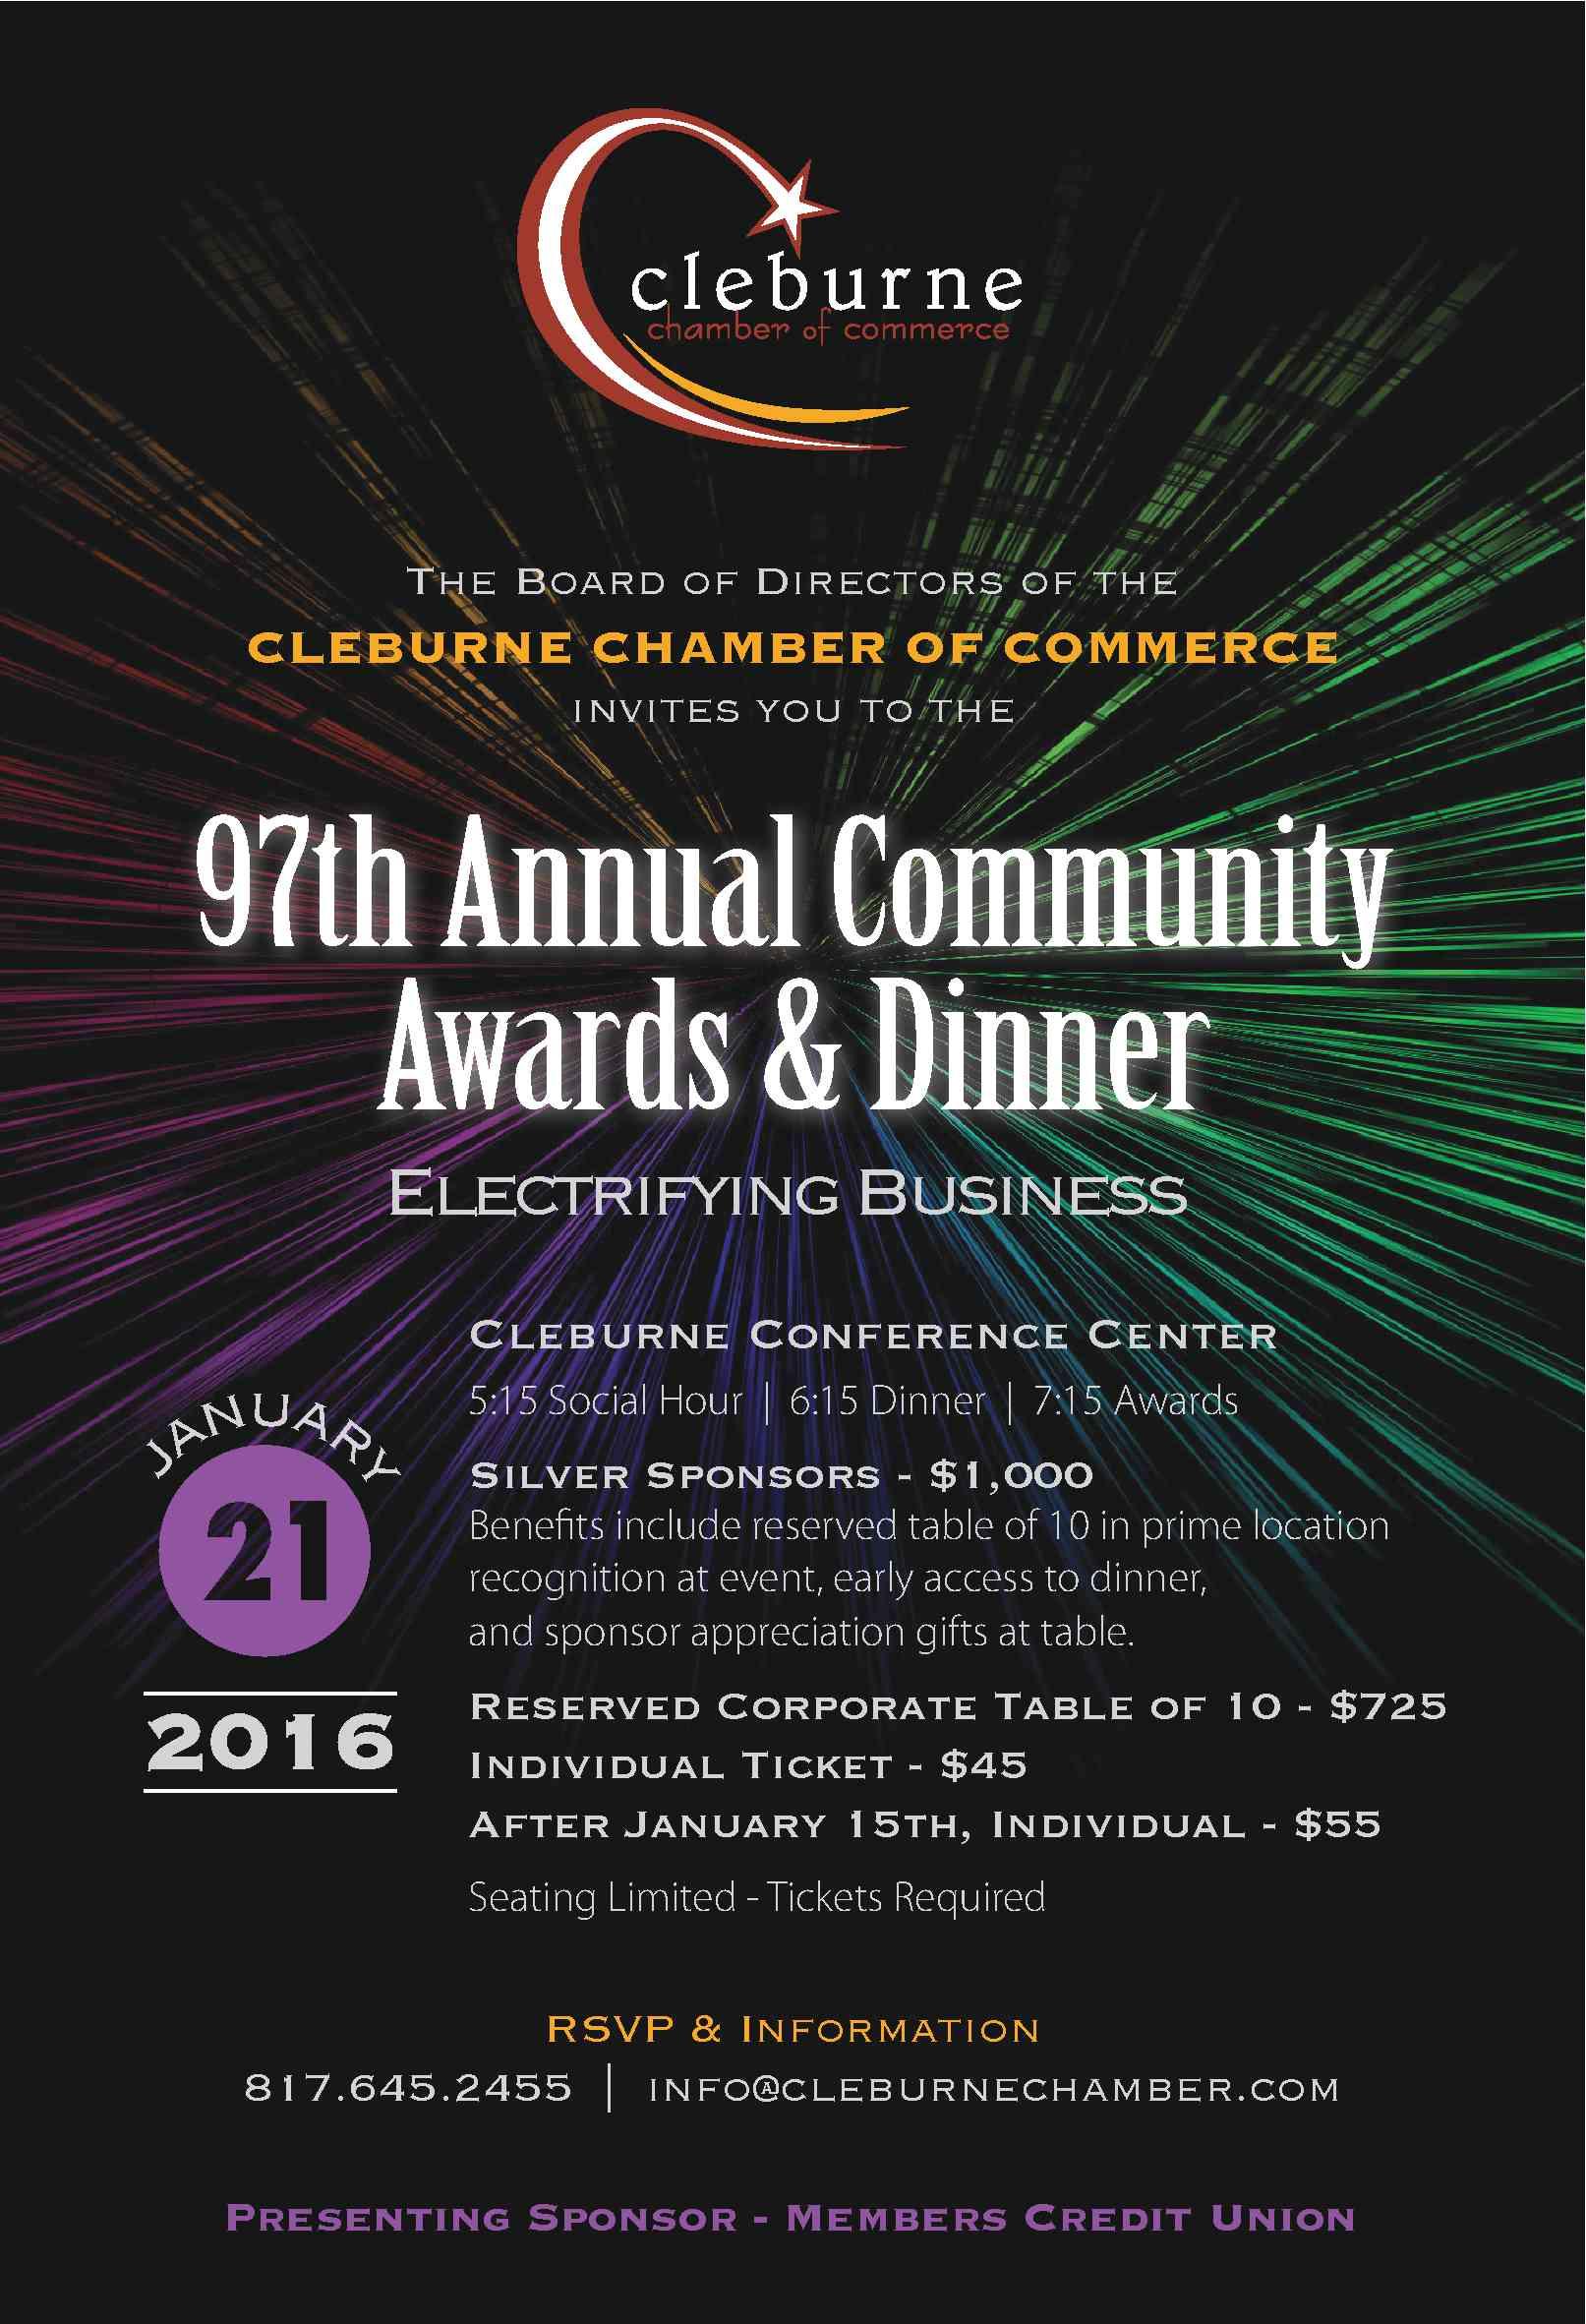 97th Annual Community Awards & Dinner